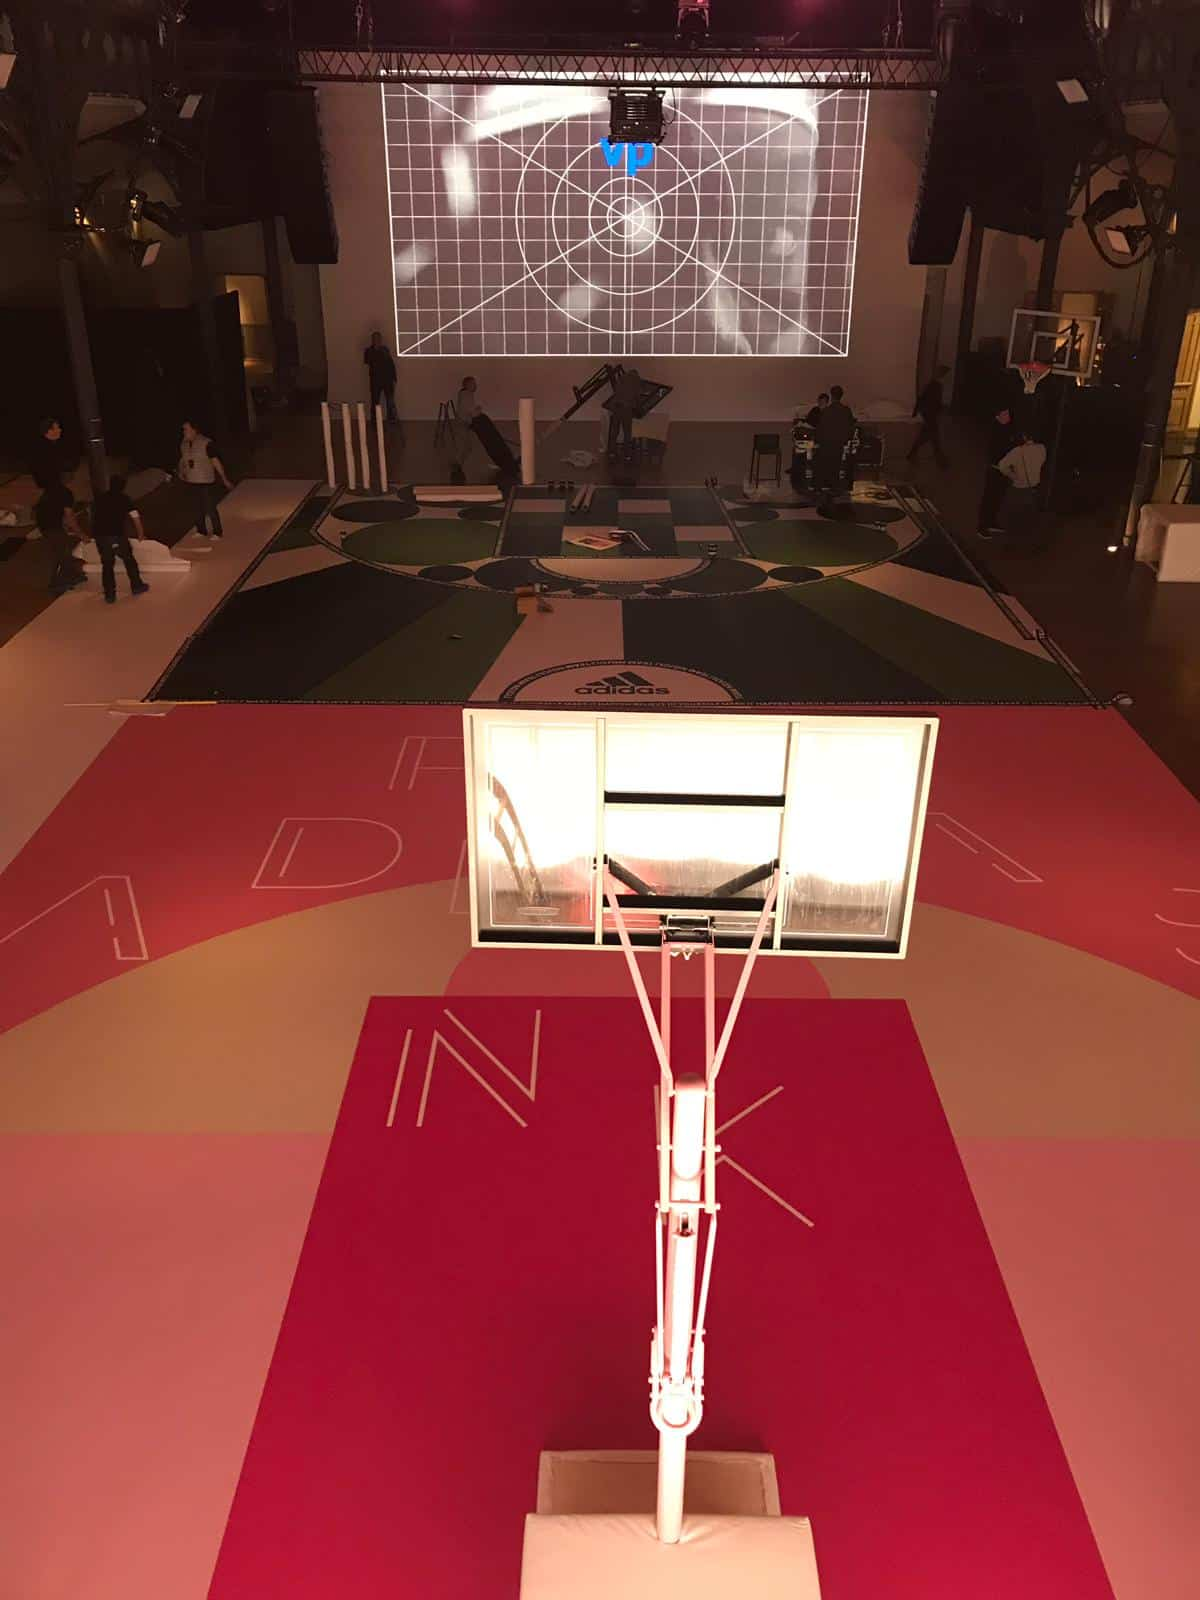 habillage événementiel paris pour adidas nakara sport